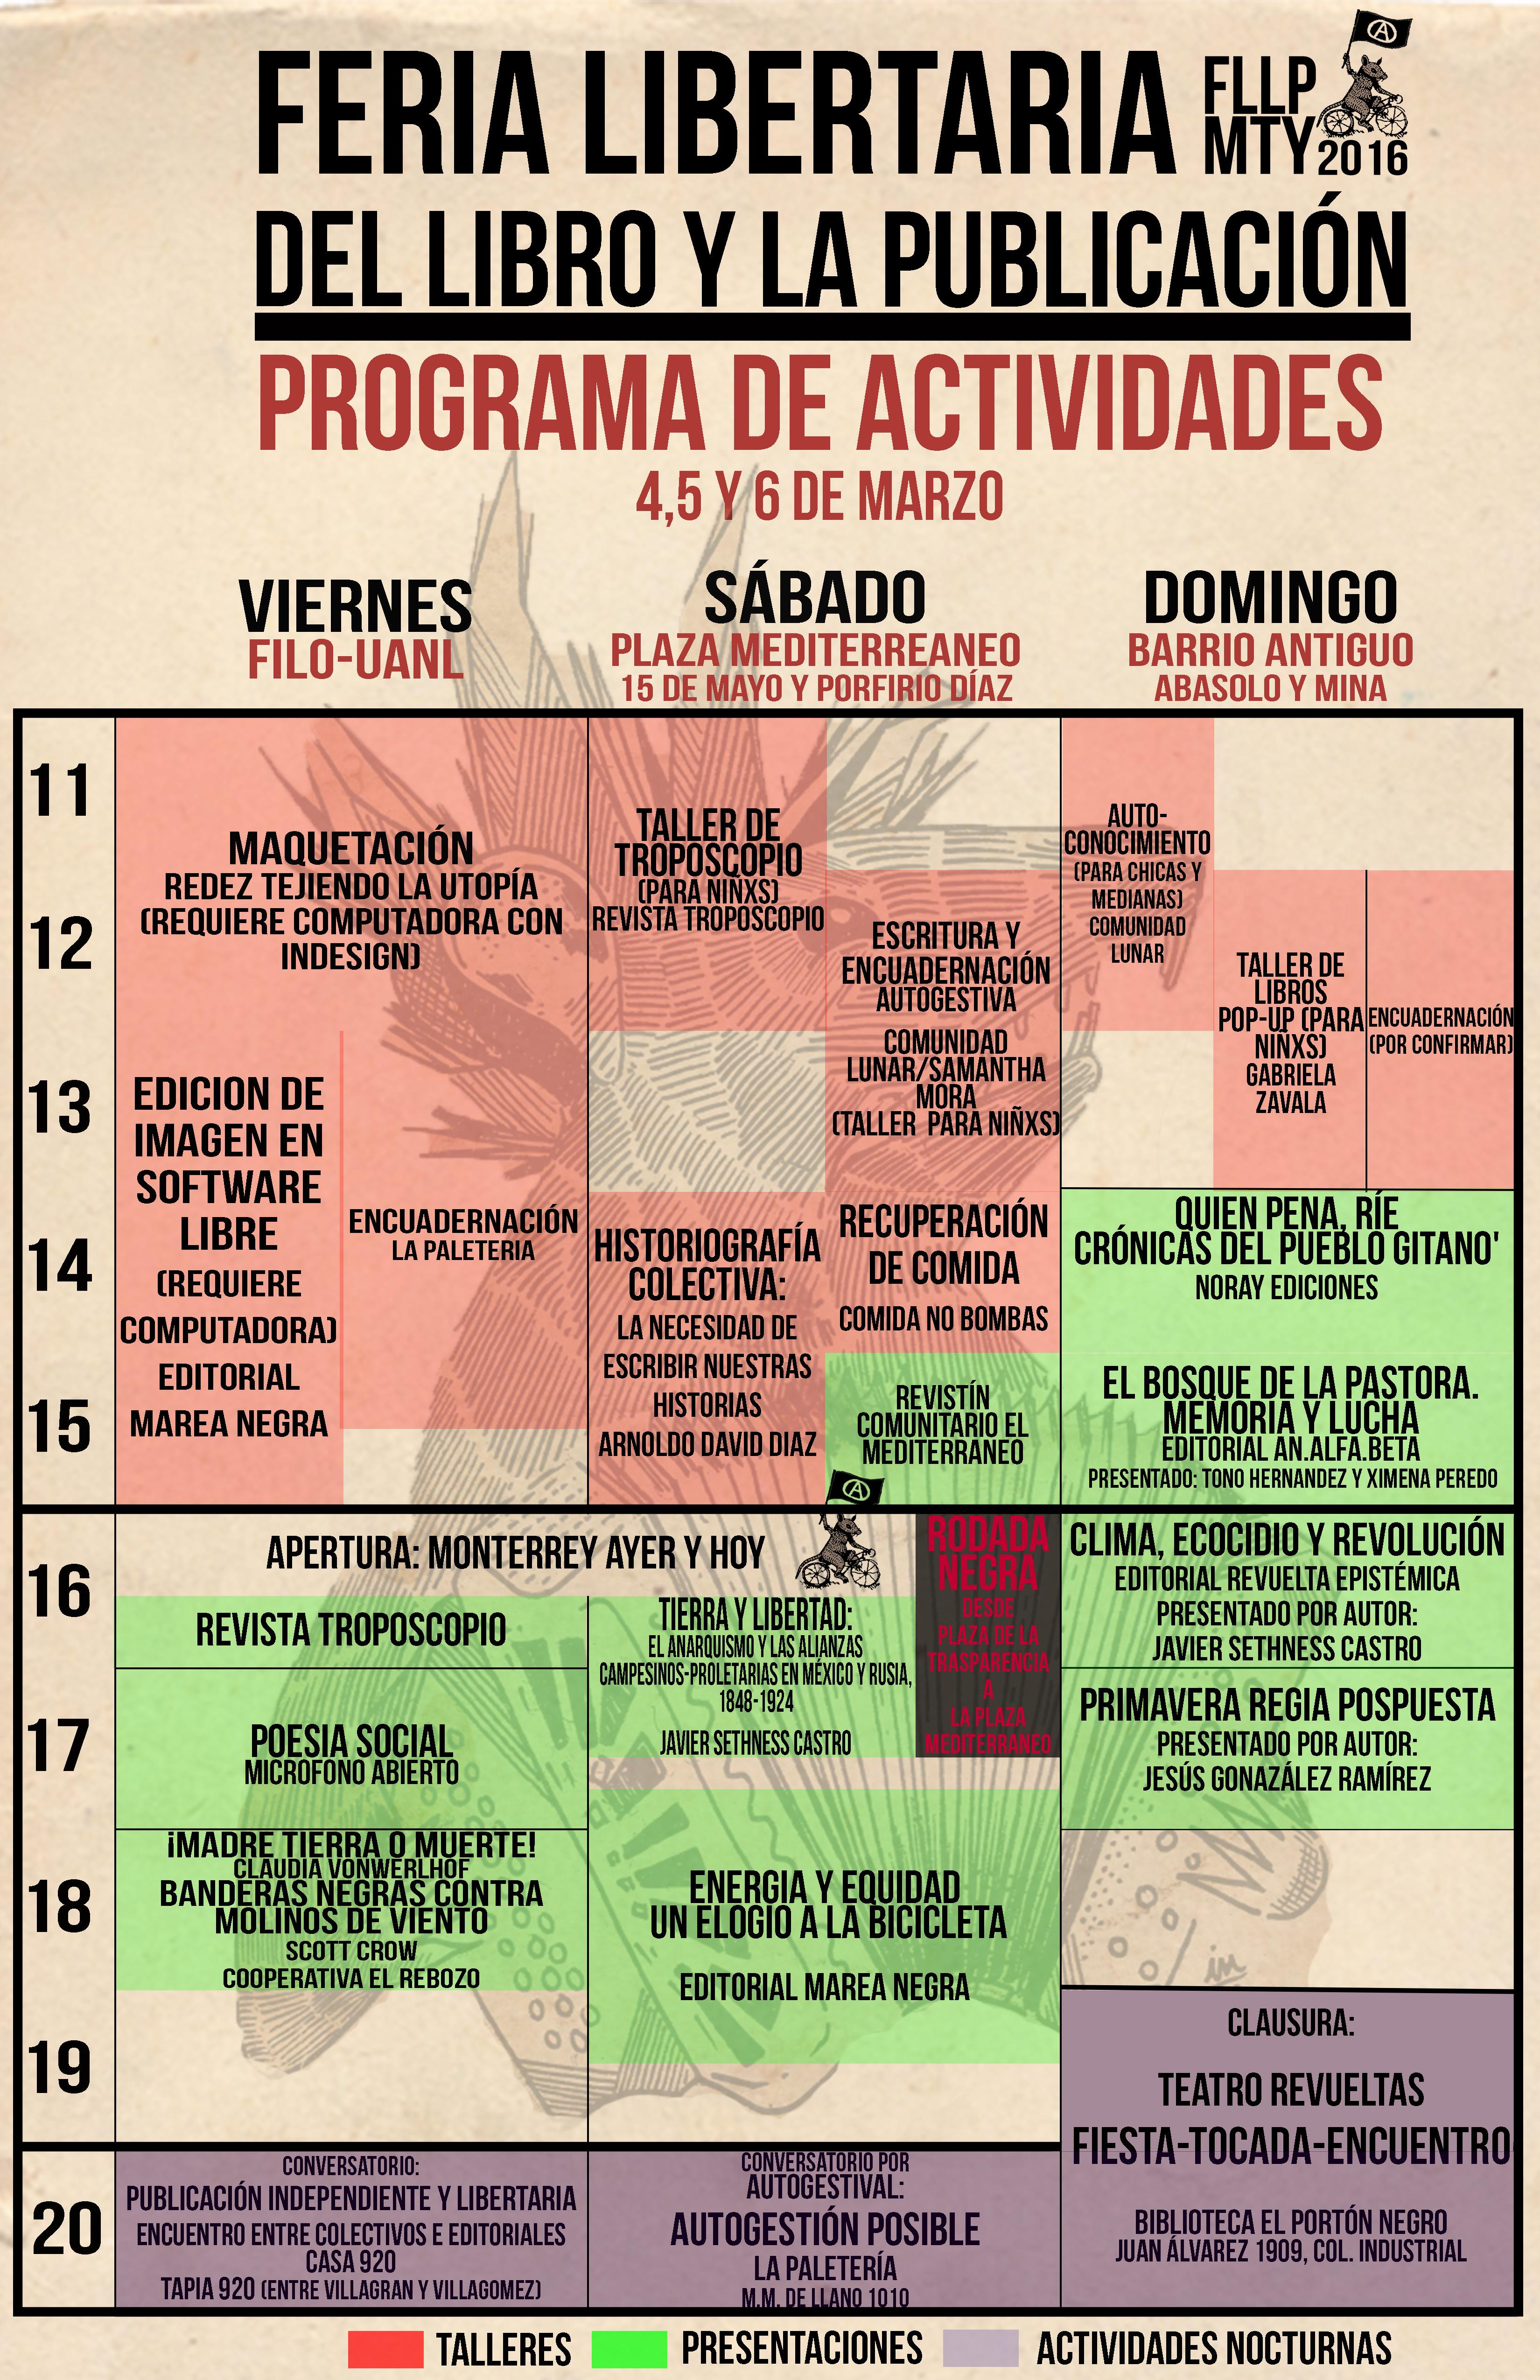 Agenda FLLP 2016